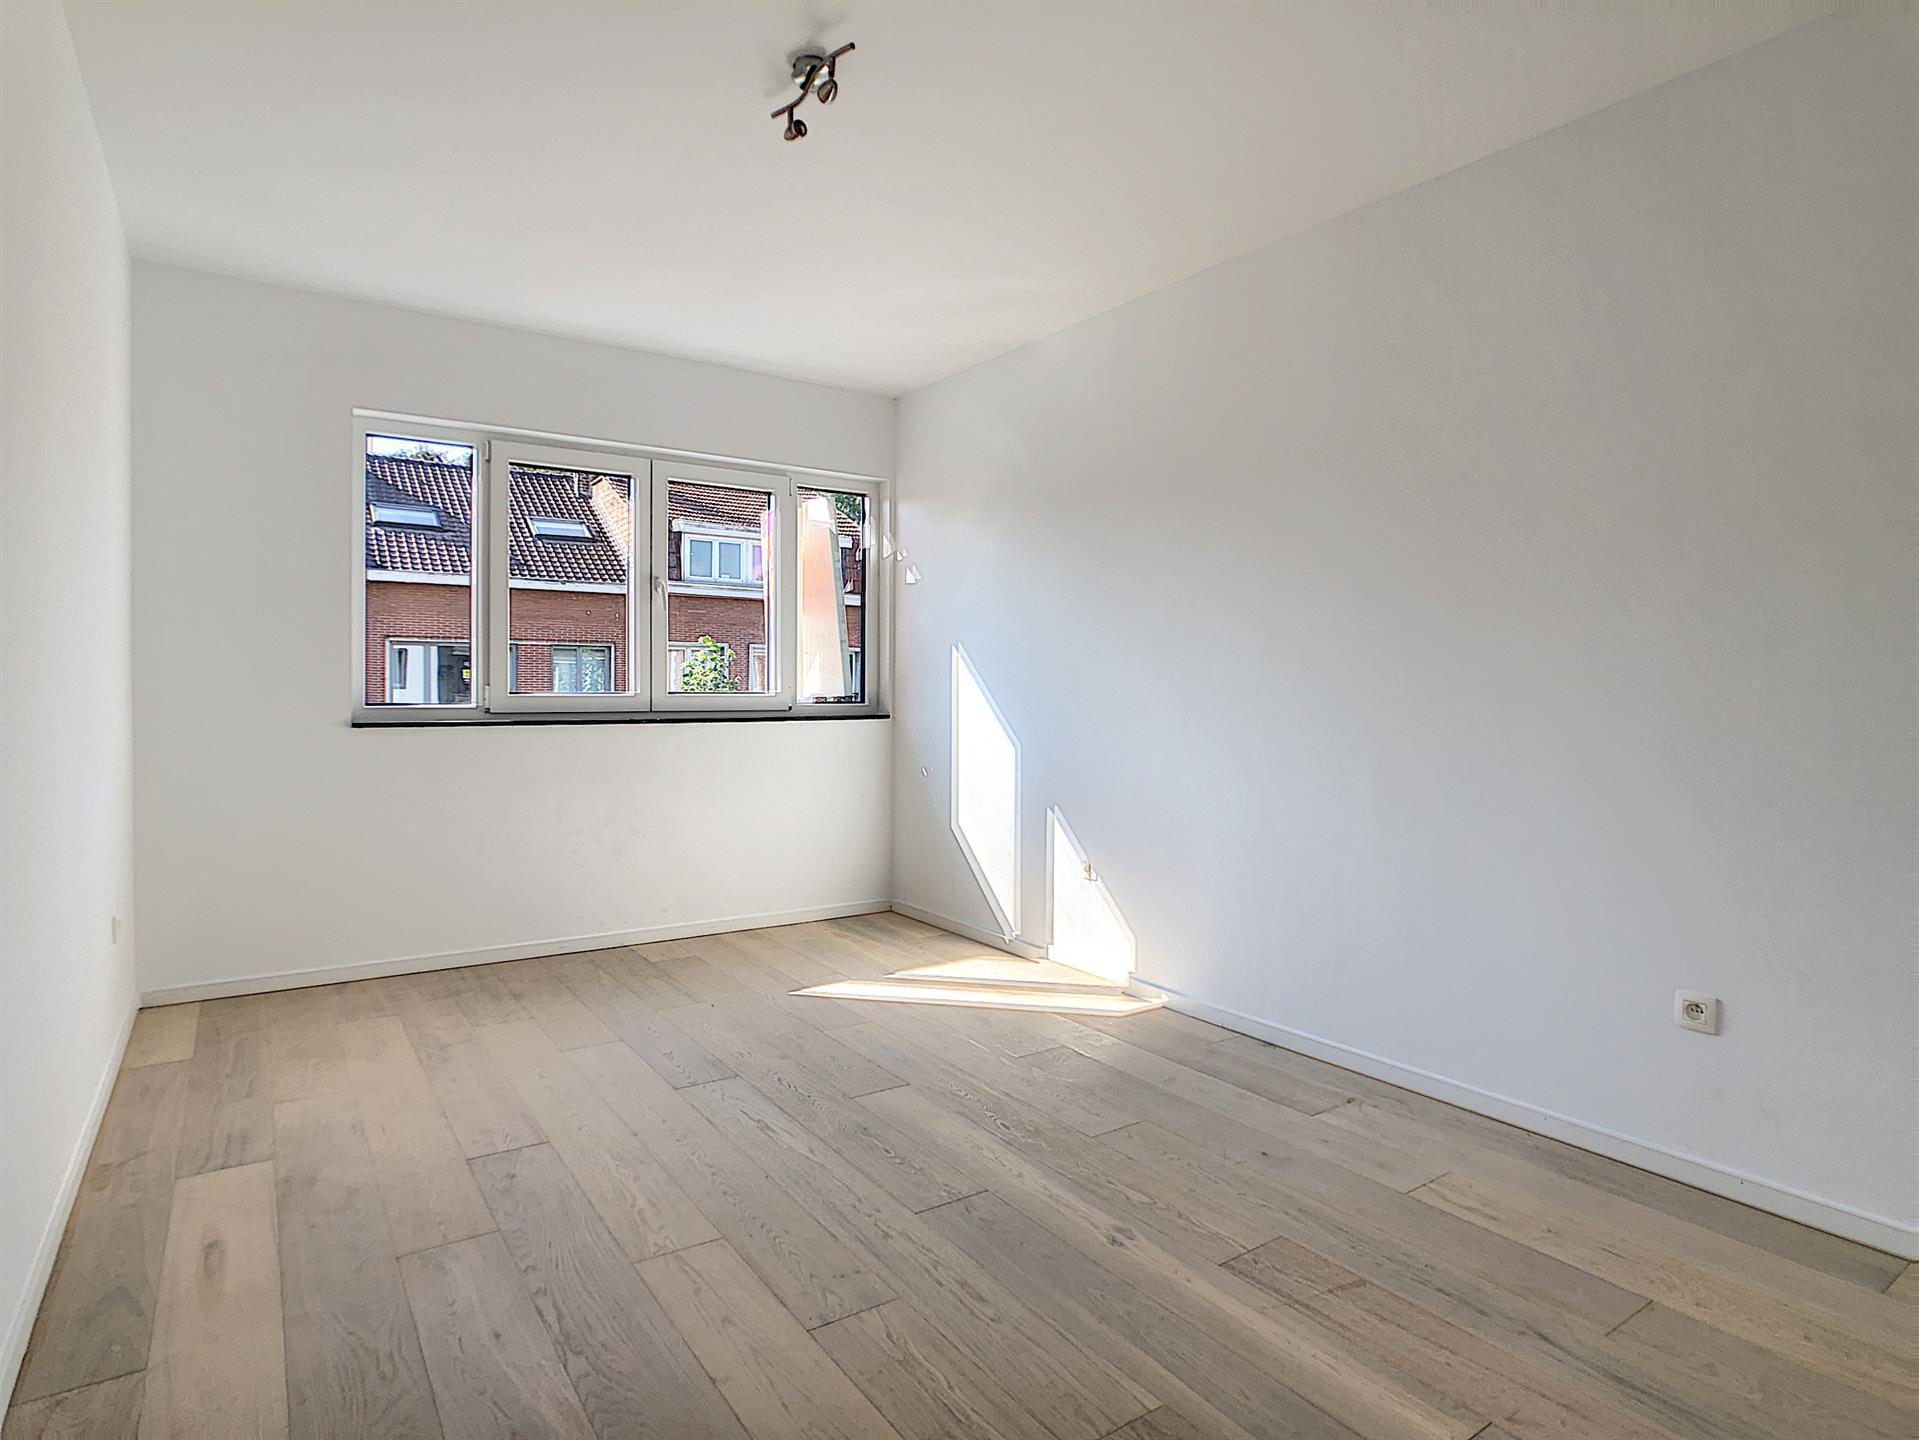 Appartement - Anderlecht - #4252377-28